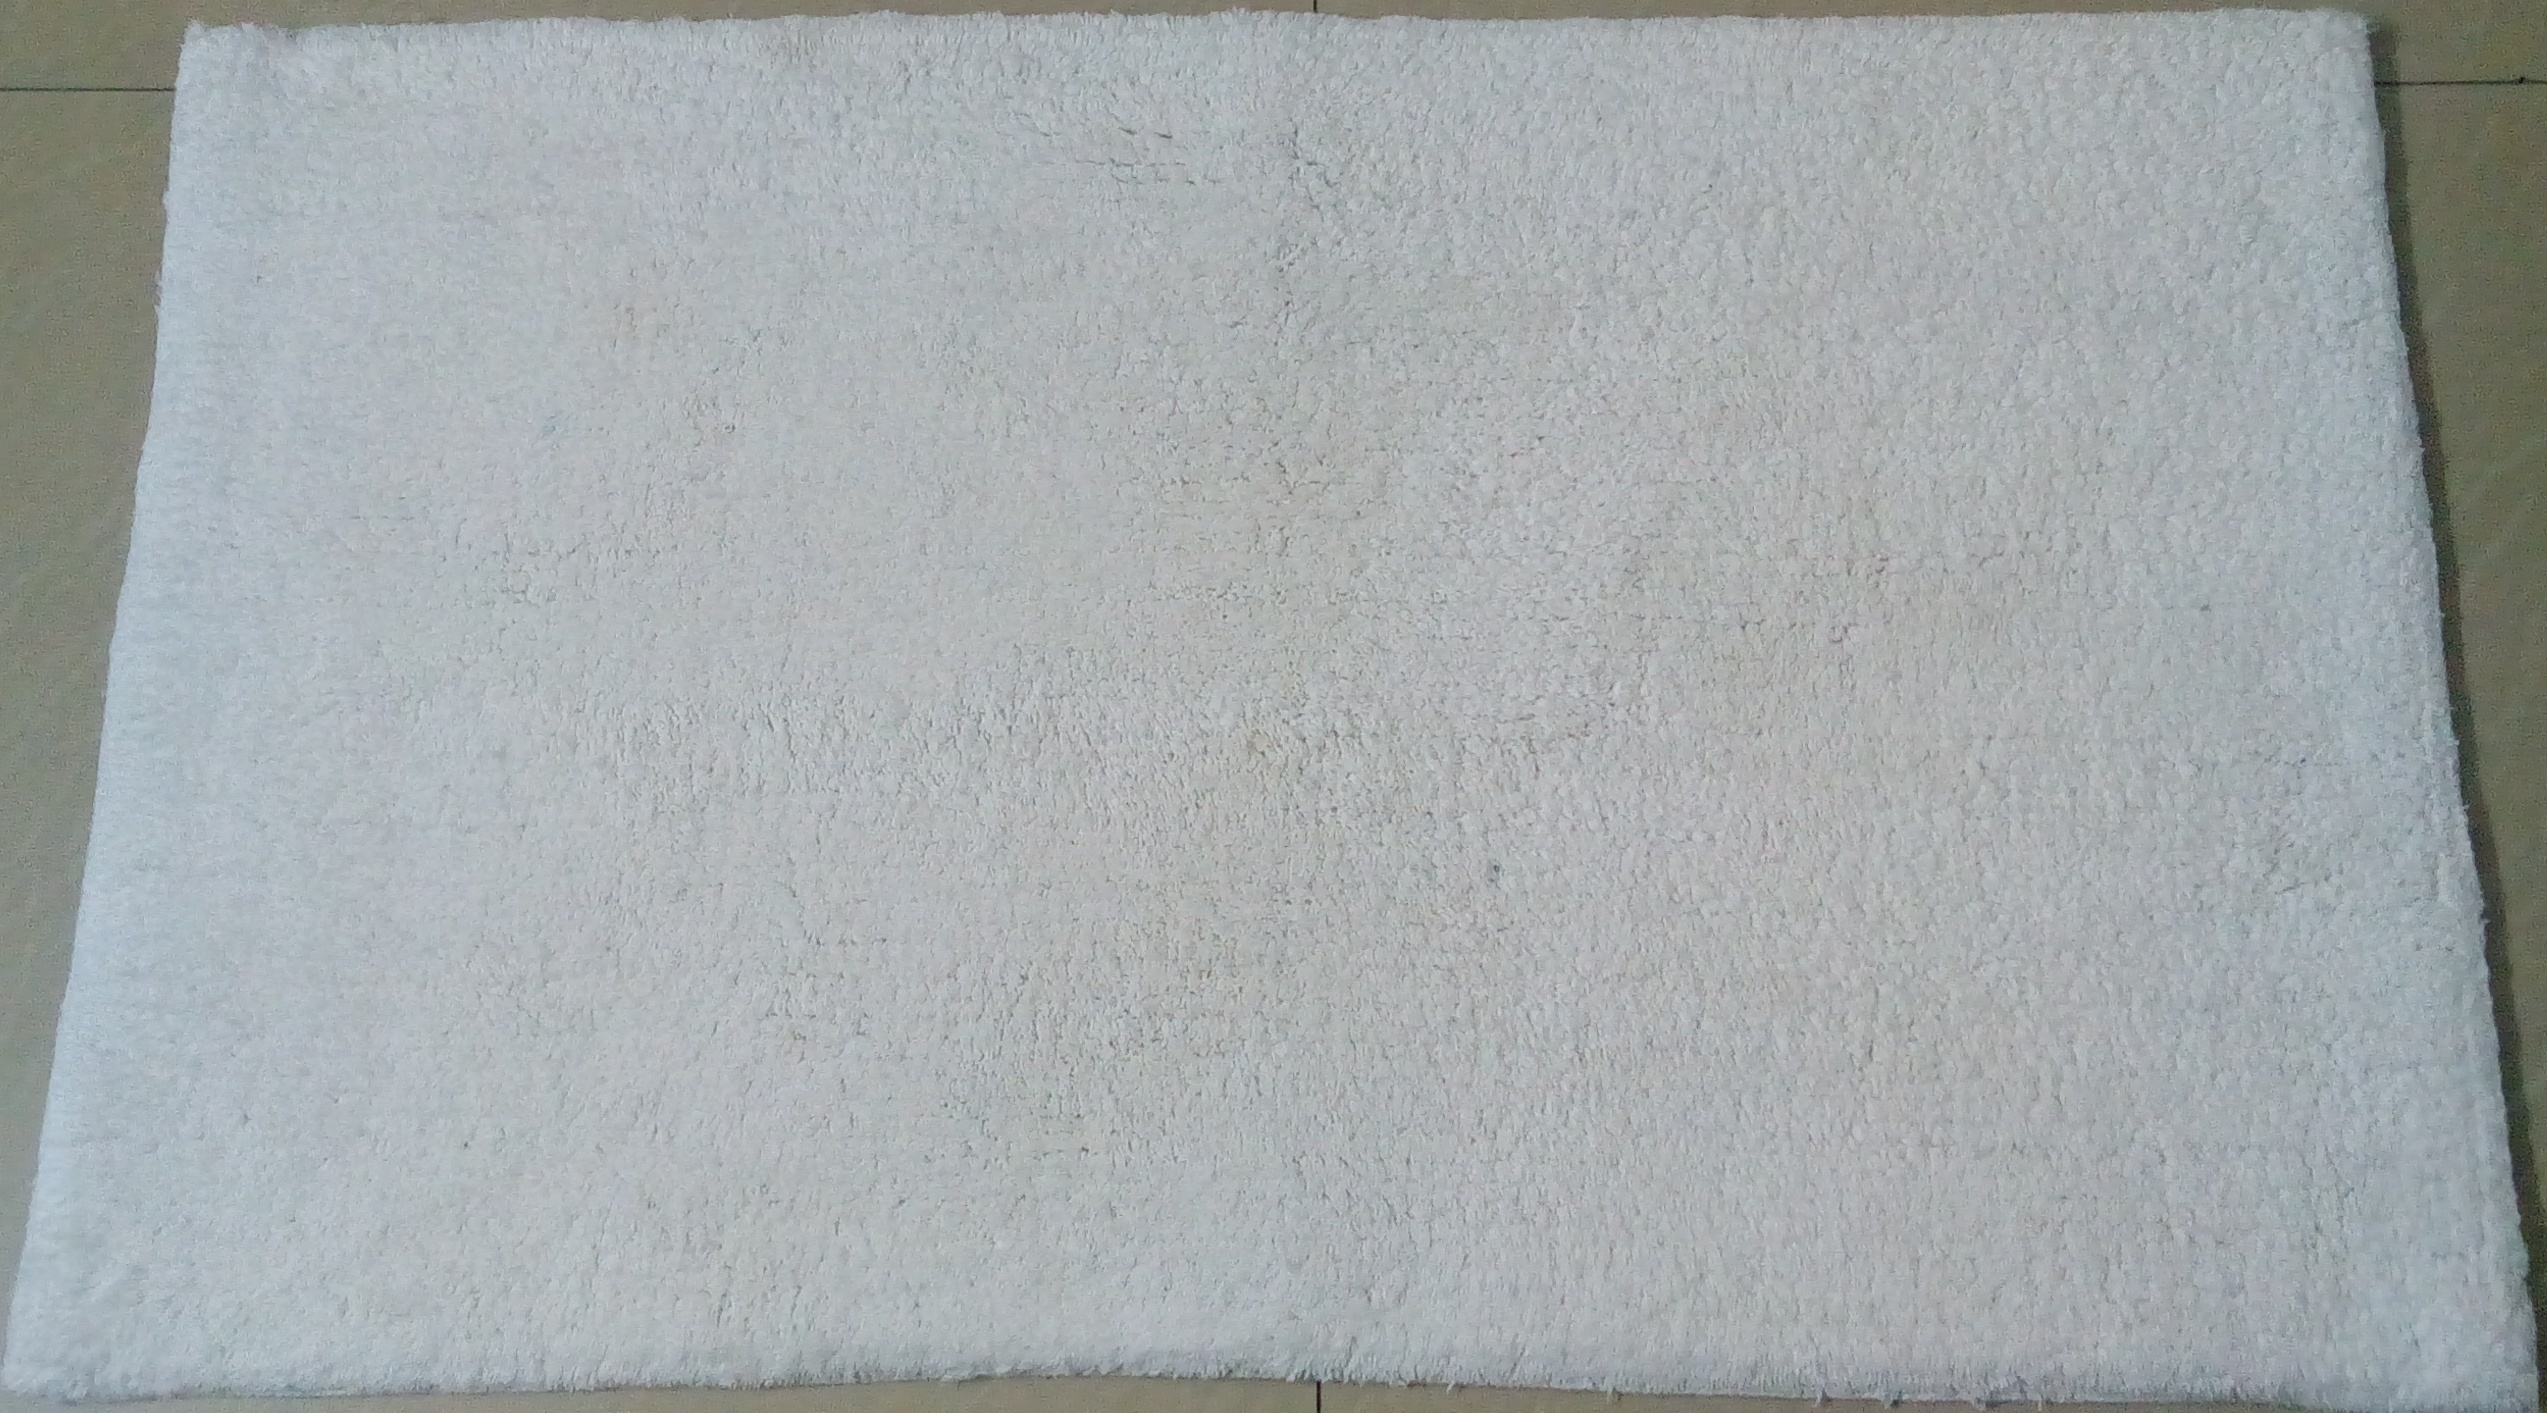 Anti Slip Rubber Cotton Bath Rug